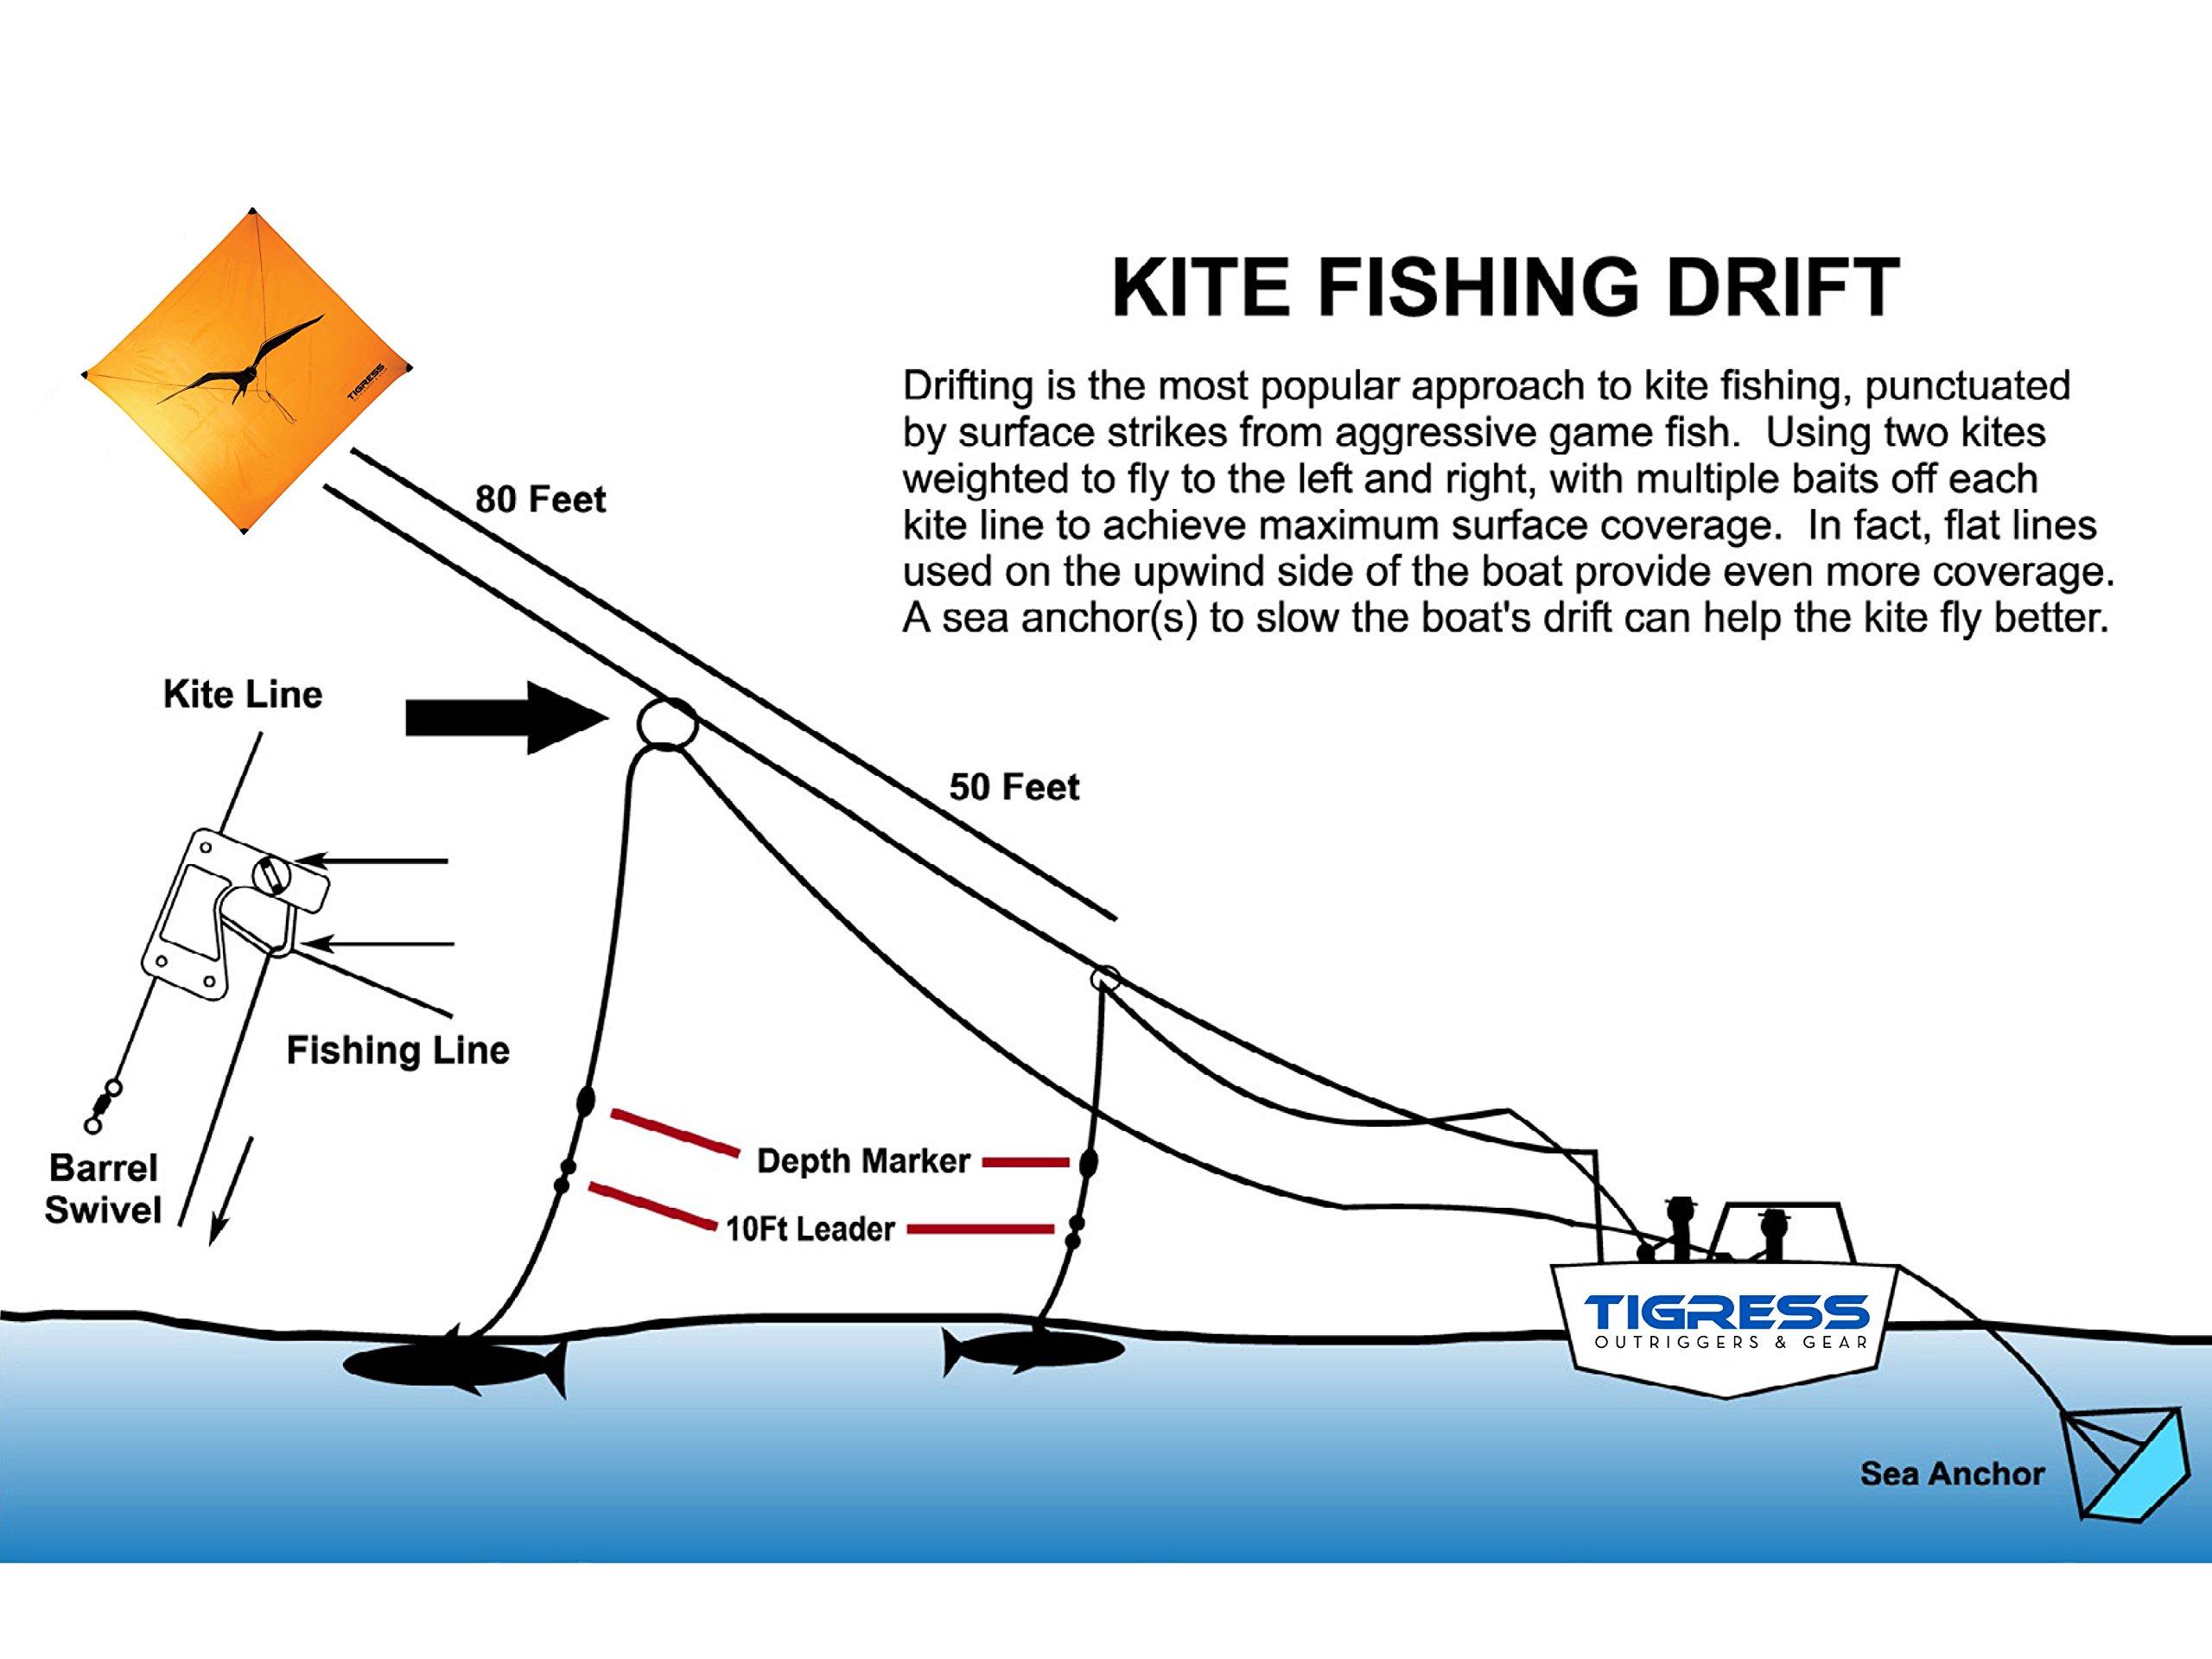 Mahi Mahi Tigress 88614 Tuna or Sailfish Kite Line III Fishing Equipment Assembly for Big Game Kite Fishing Such as Shark Wahoo